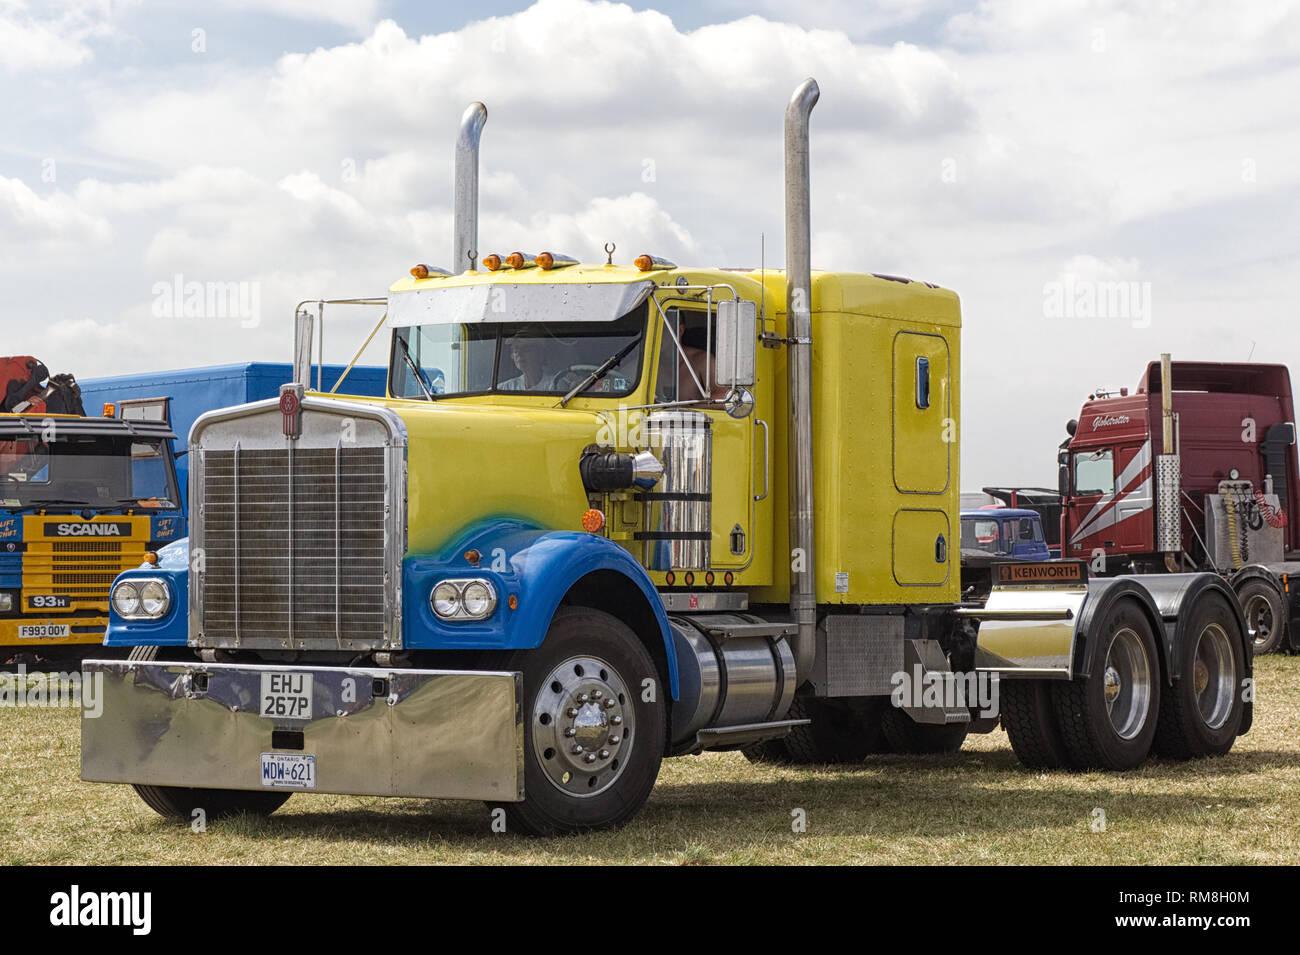 spray painted Kenworth American Trucks - Stock Image